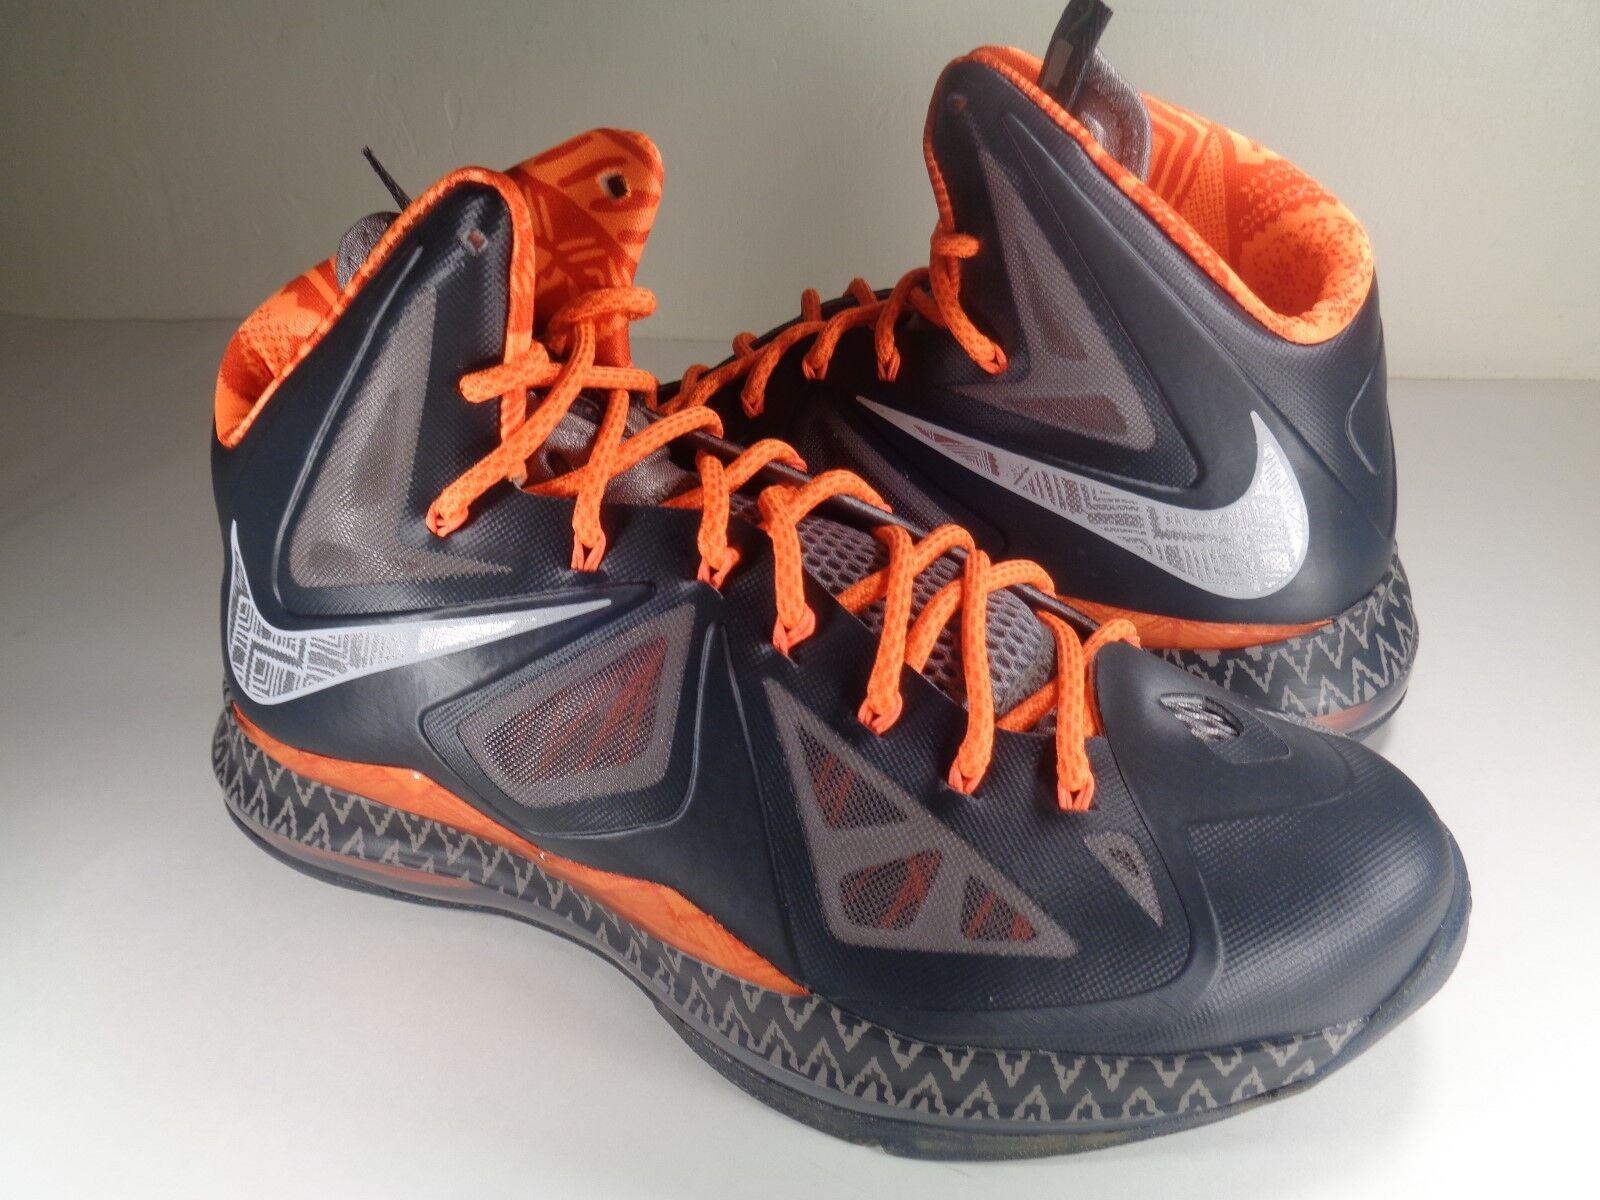 Nike Lebron X 10 BHM Black History Month Anthracite Grey SZ 9.5 (583109-001)